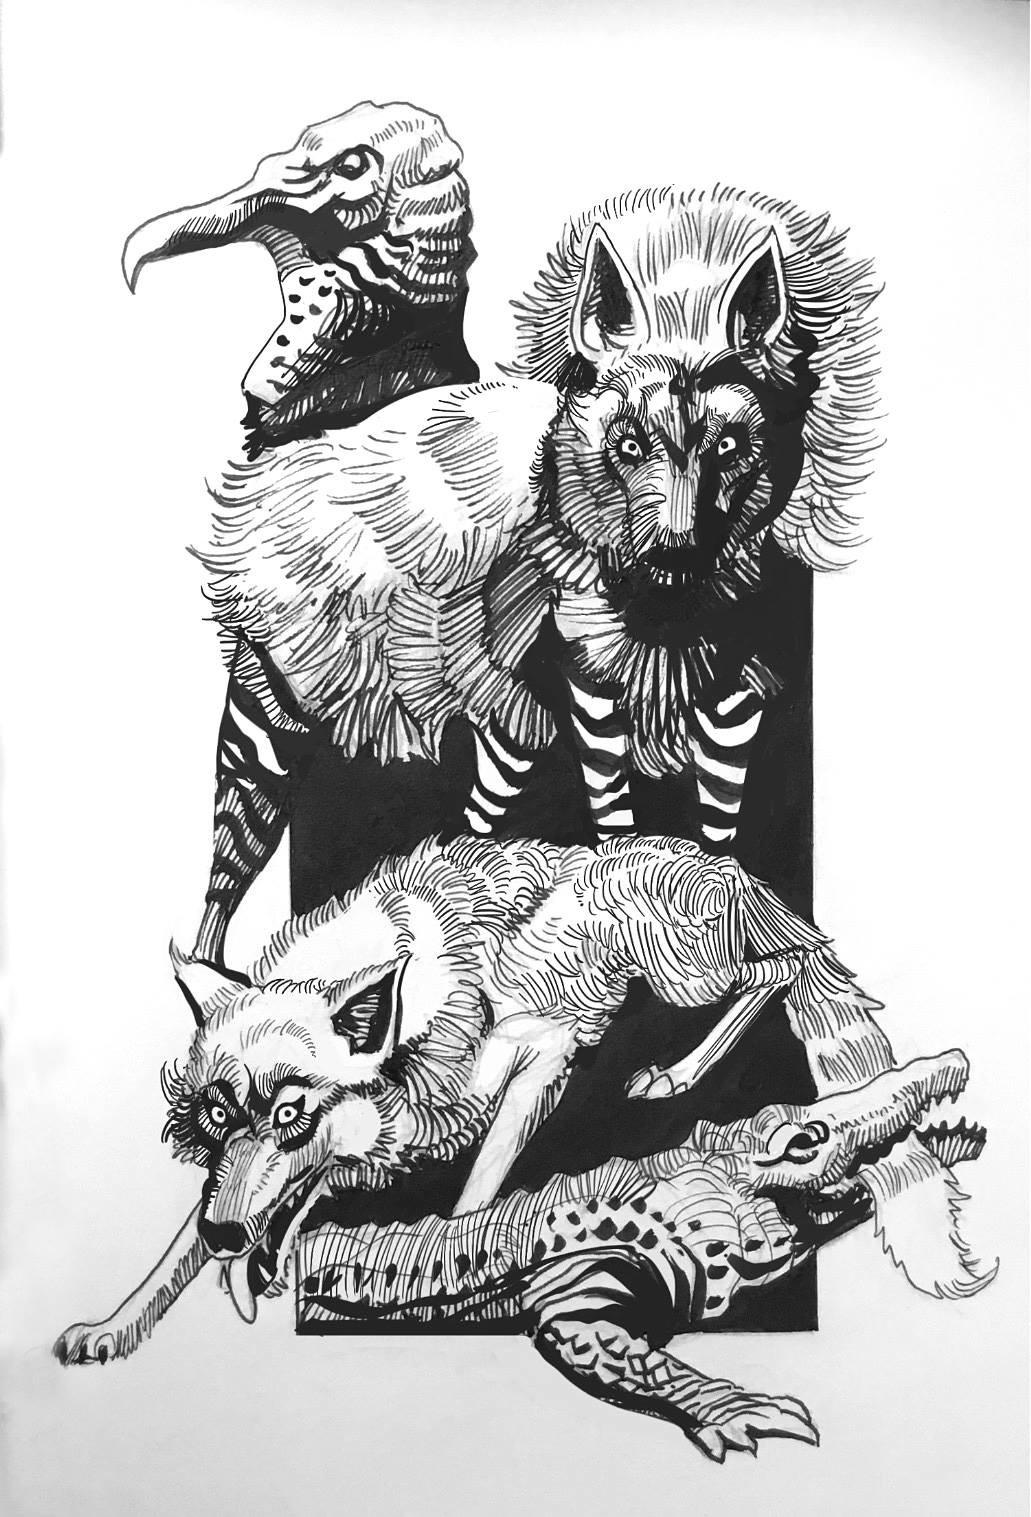 Hugo puzzuoli hyenne comp01